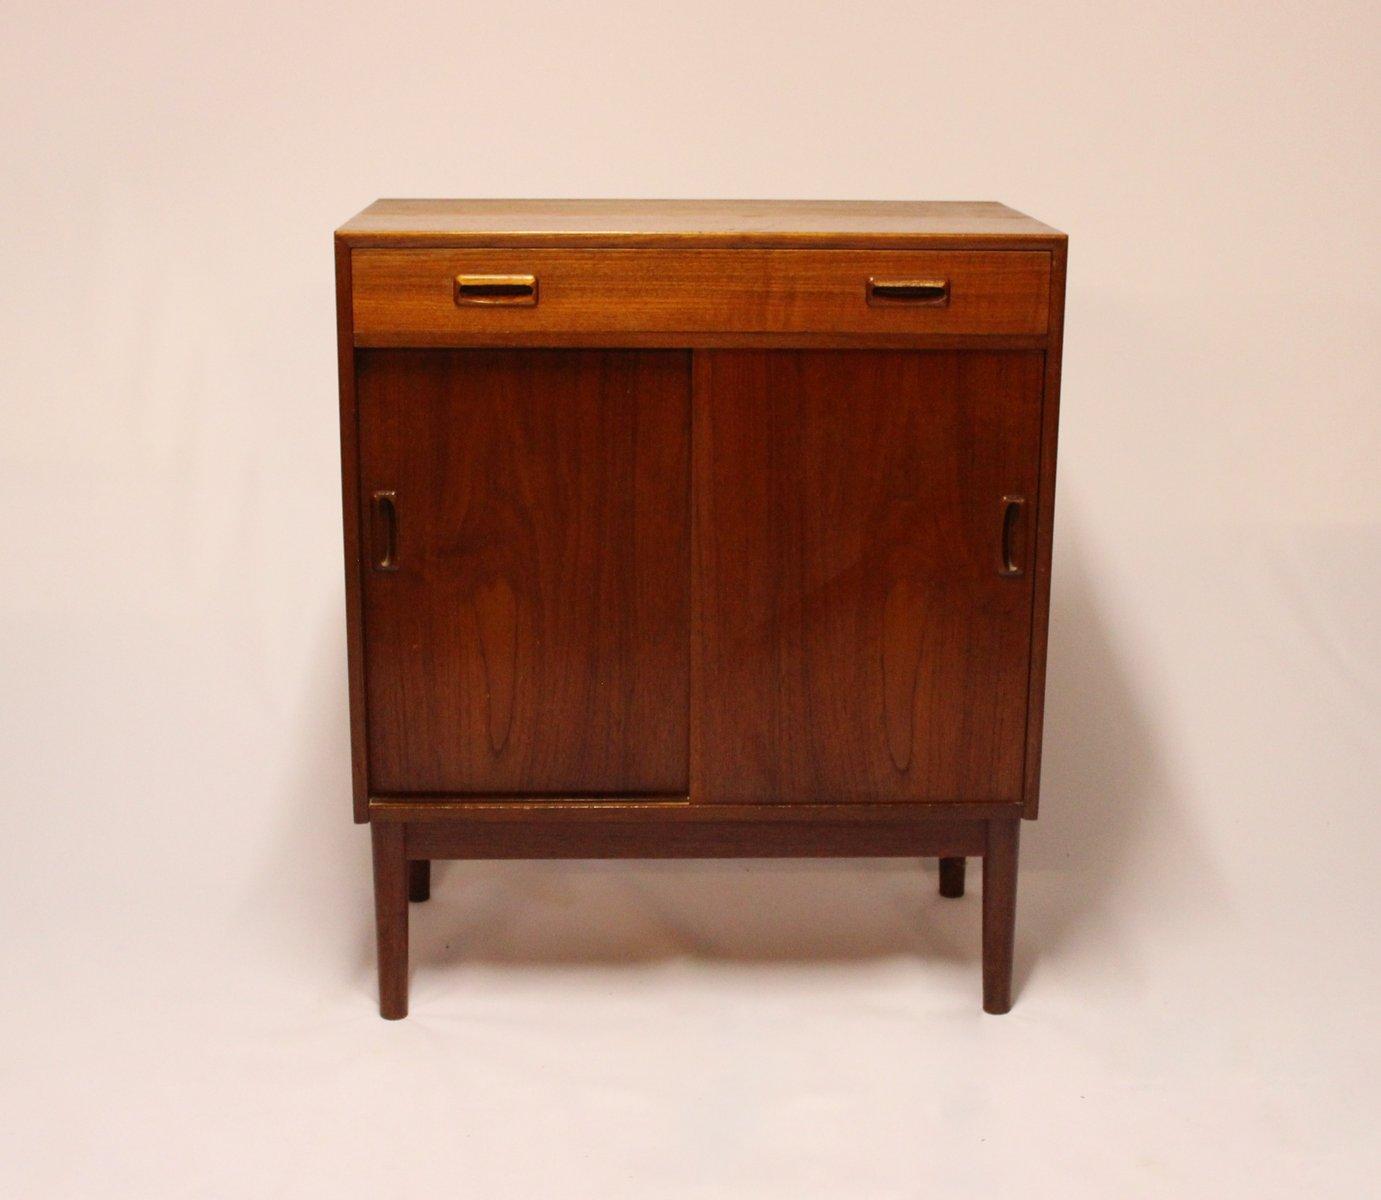 Teak Kitchen Cabinet Doors: Danish Teak Cabinet With Sliding Doors, 1960s For Sale At